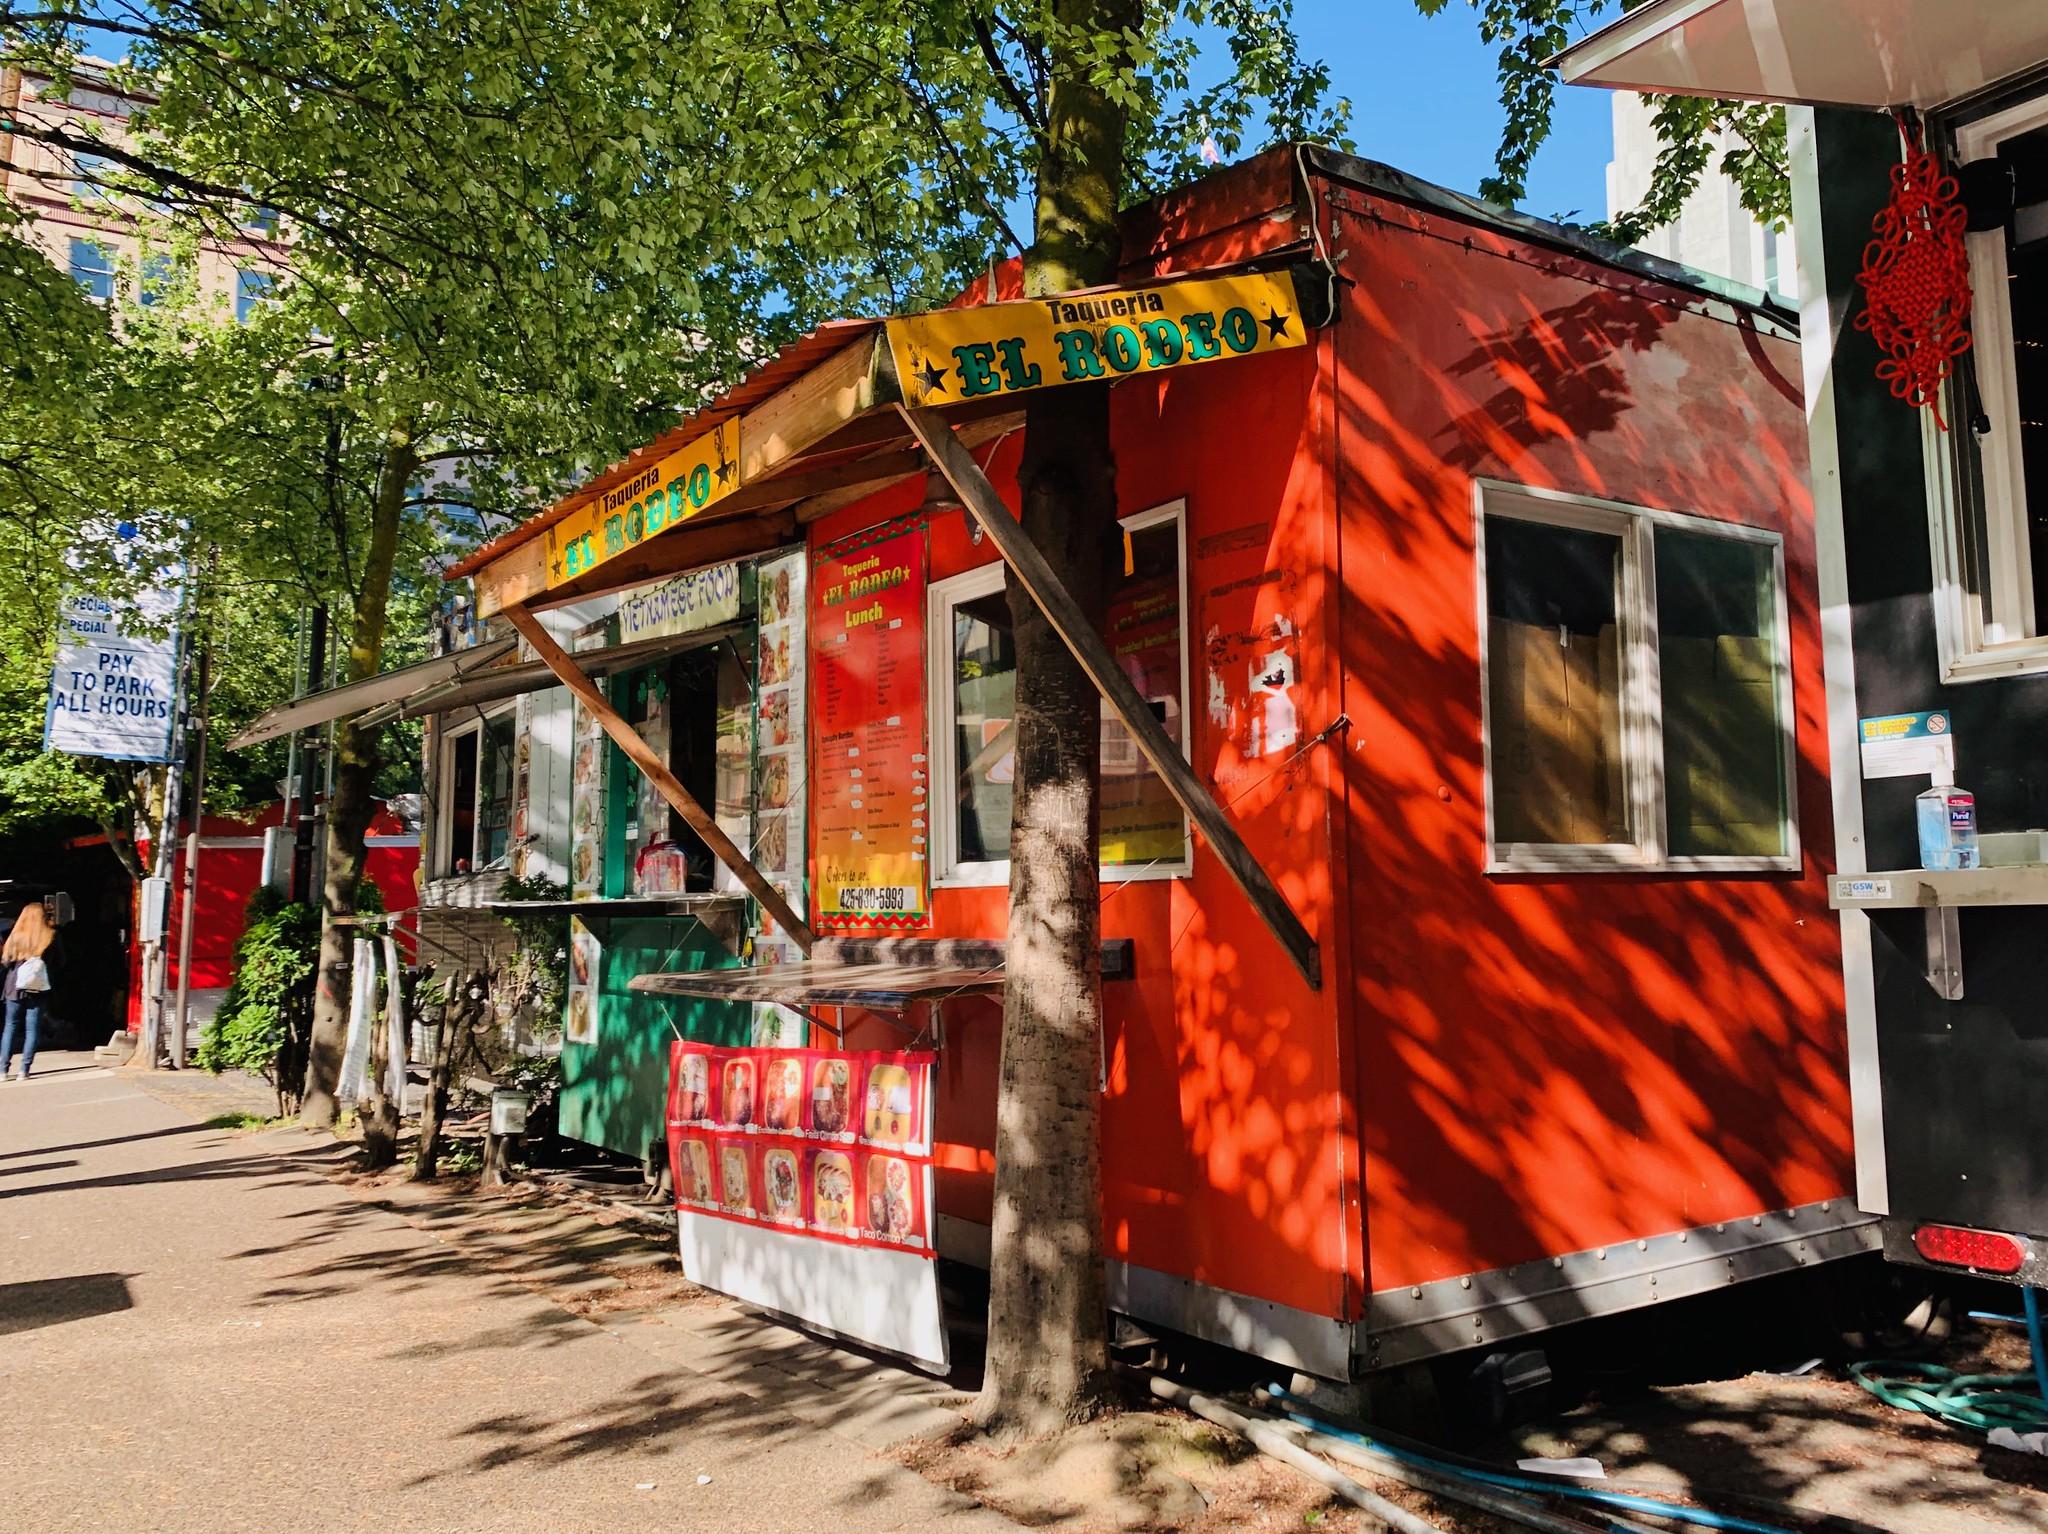 Bright red food cart Taqueria El Rodeo in the sun